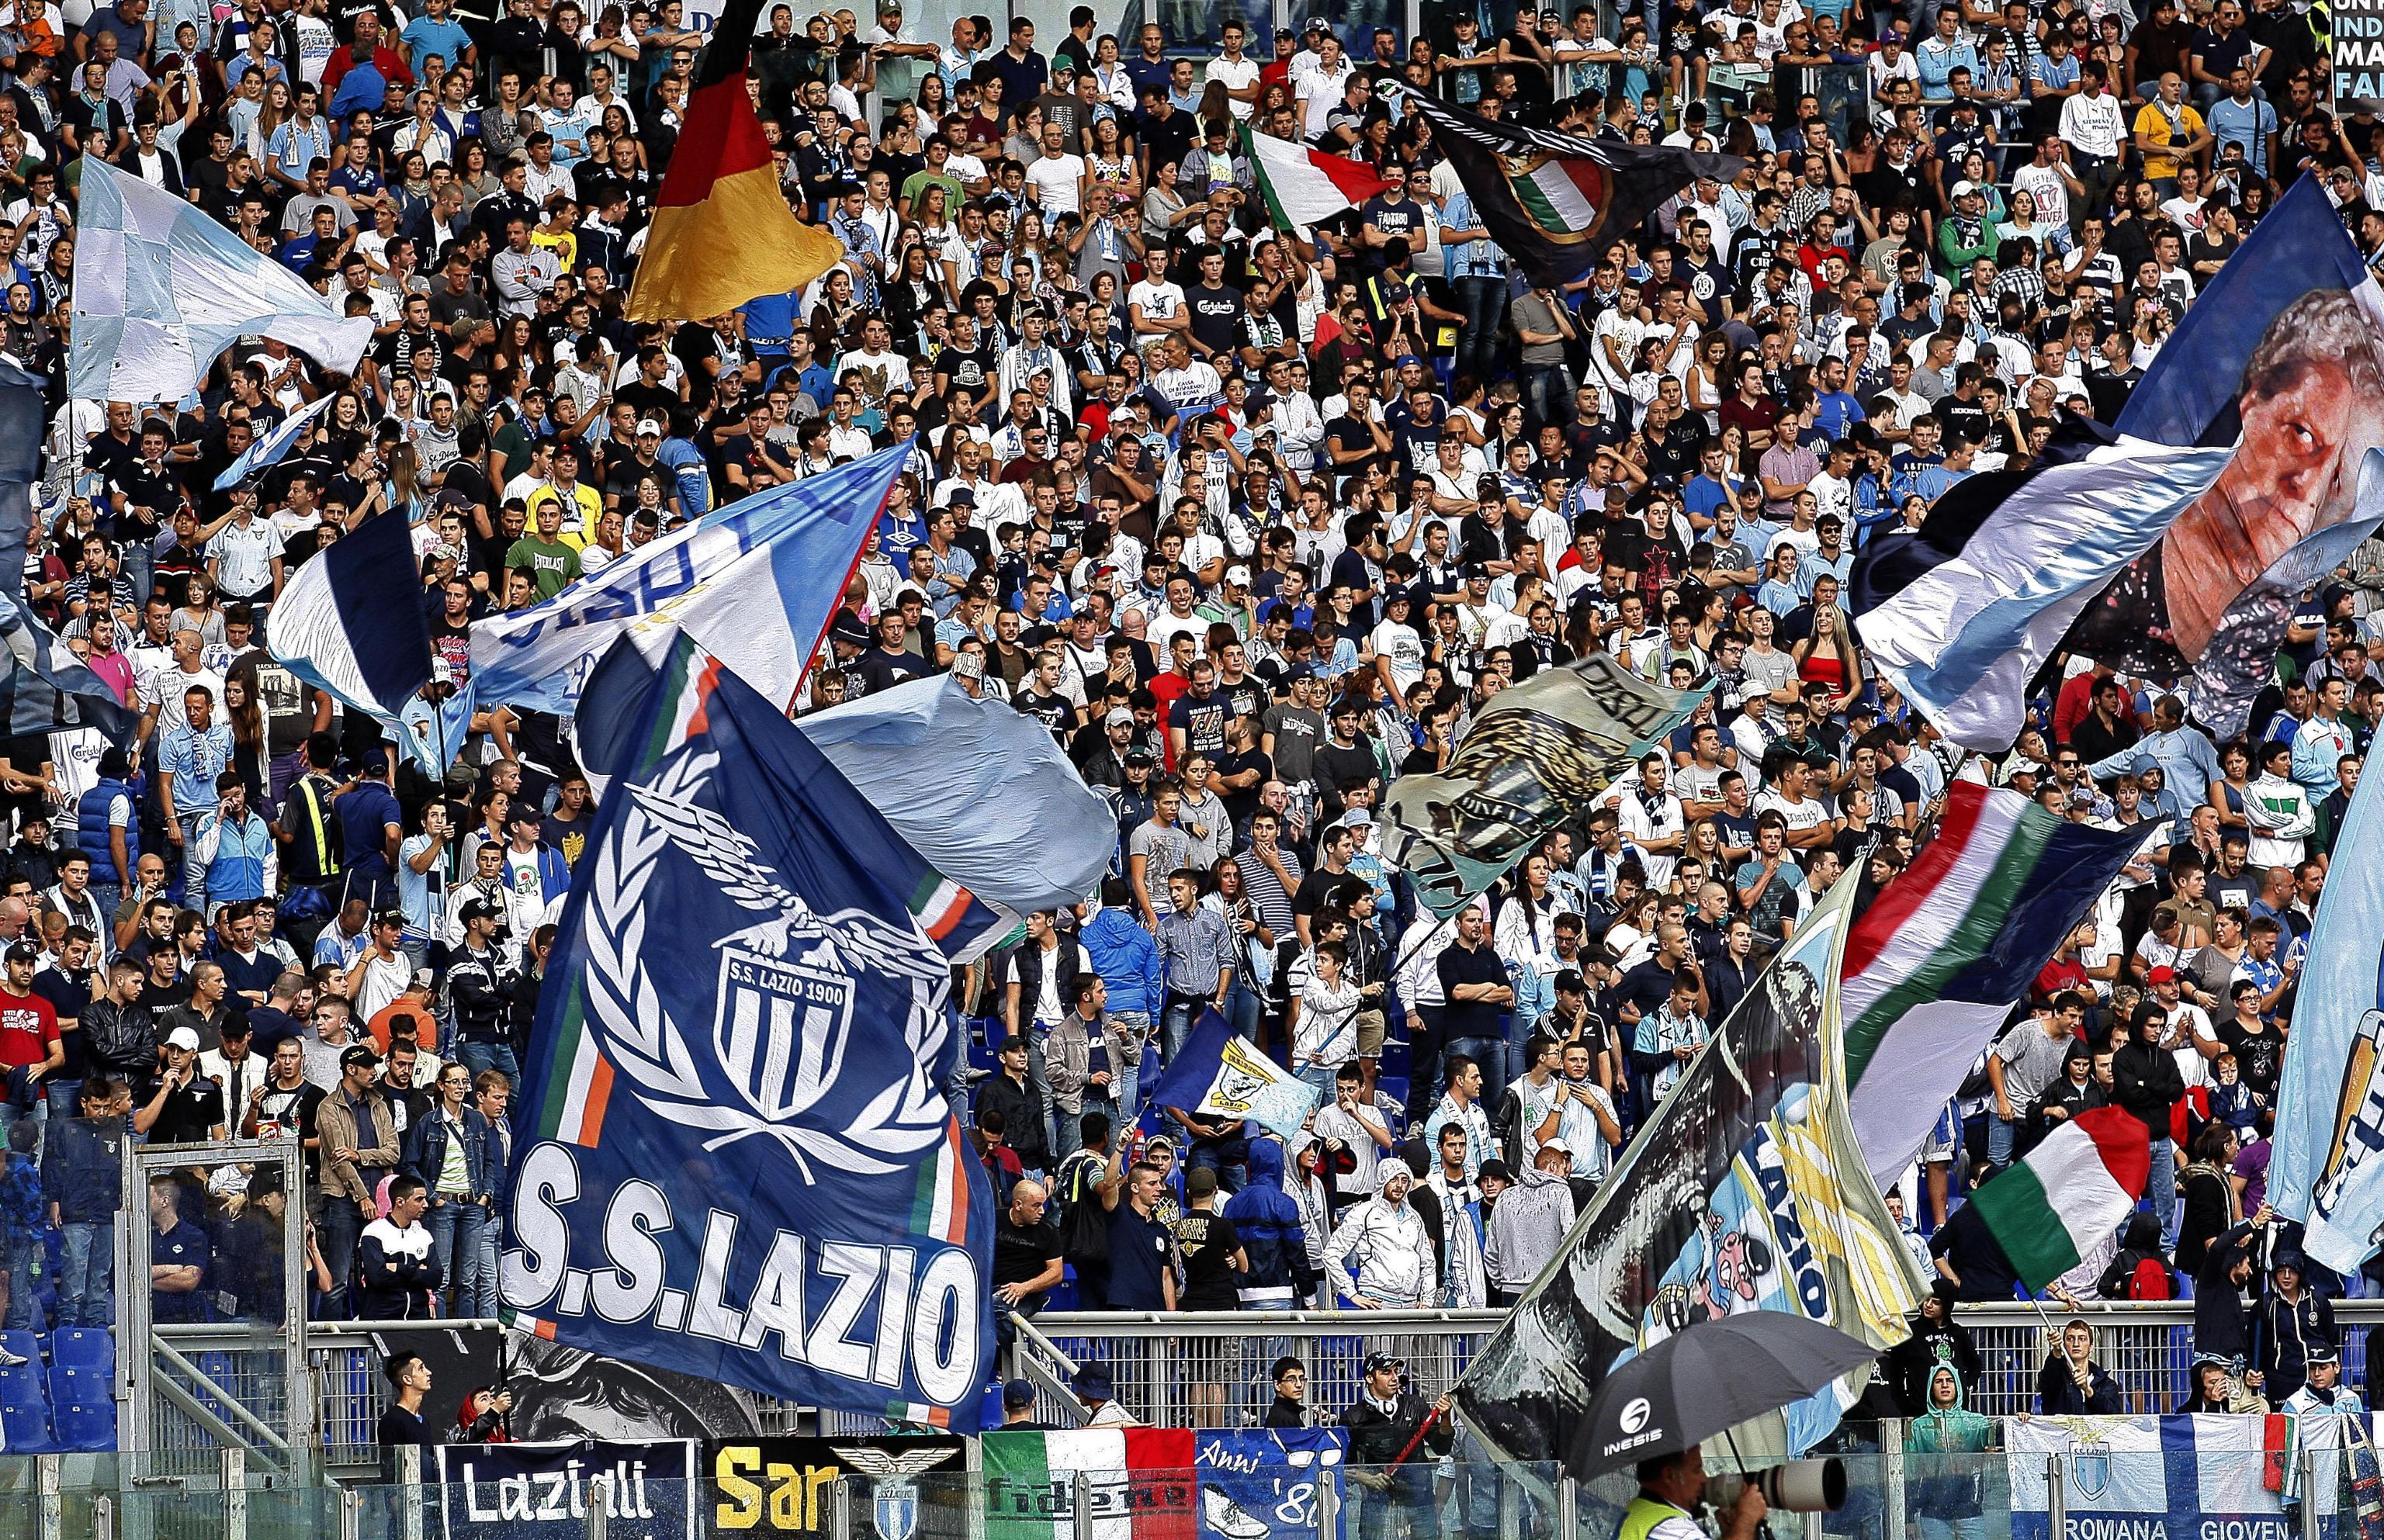 La Lazio senza la sua Nord al derby